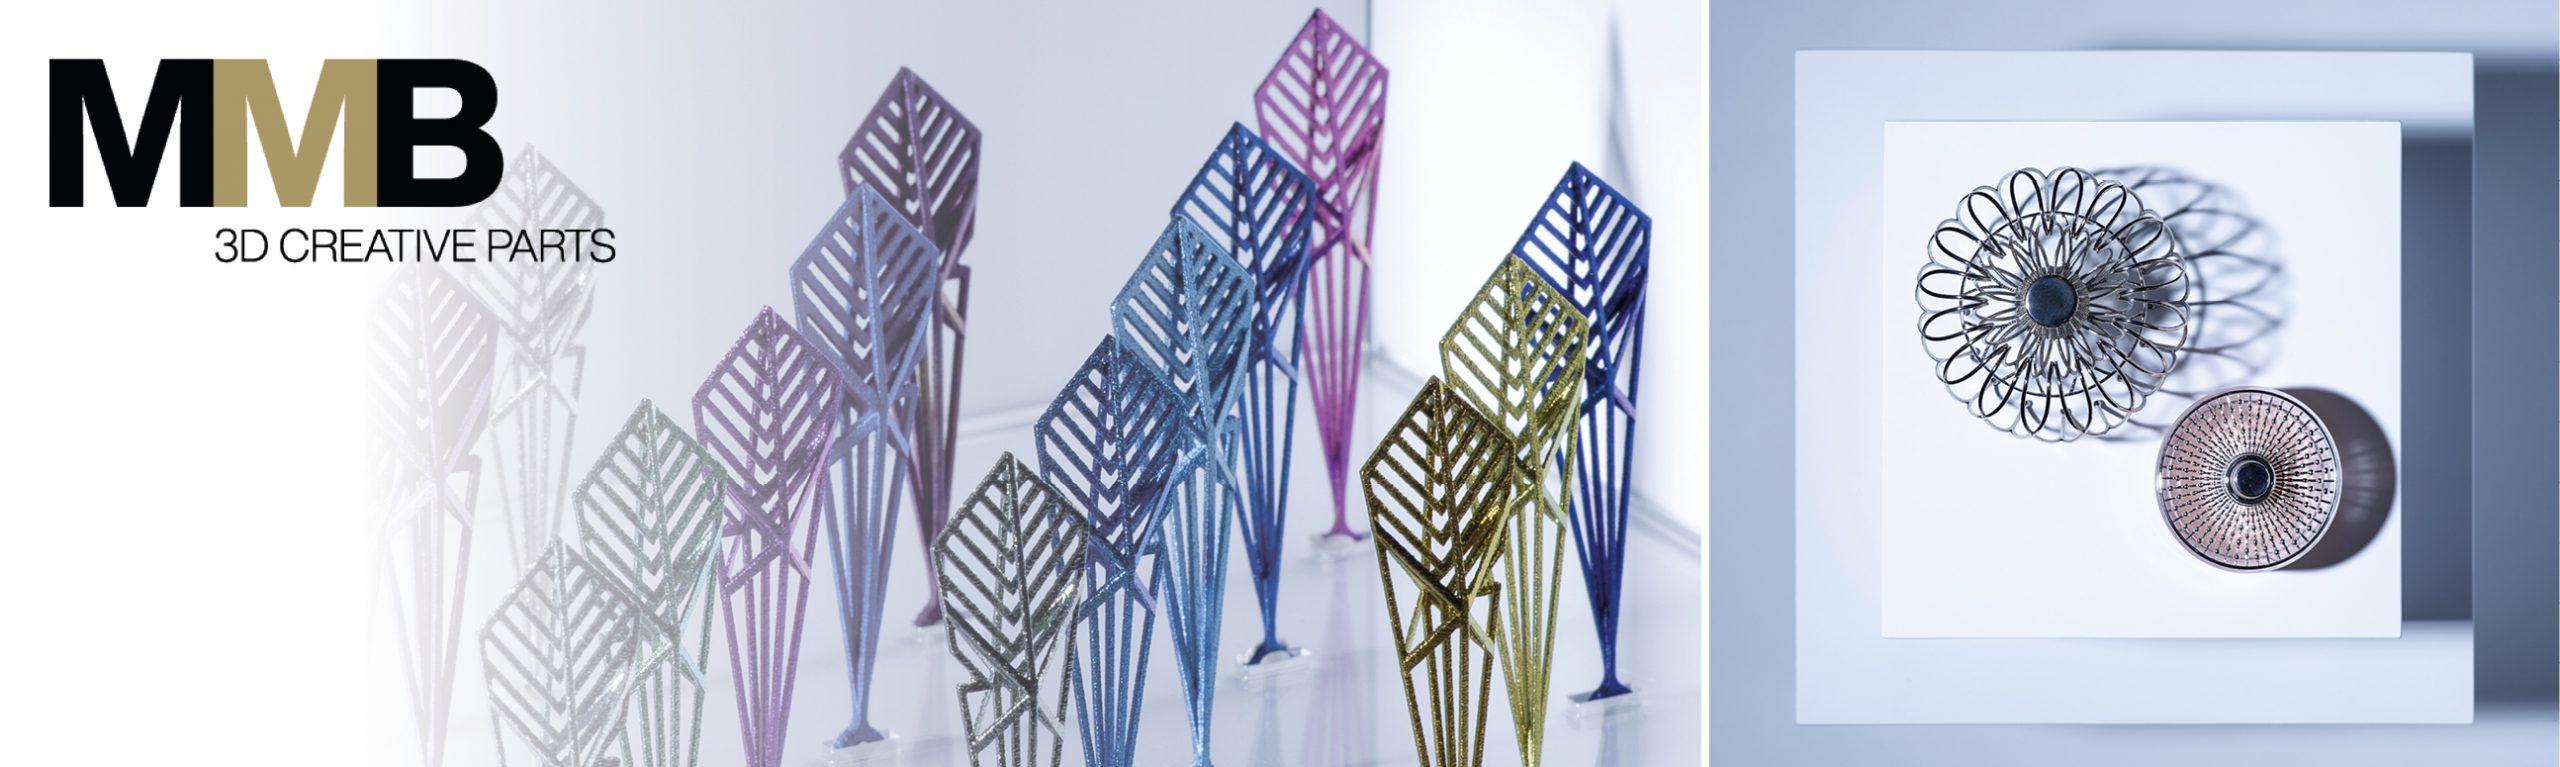 MMB, la fabrication additive métal au service du Luxe